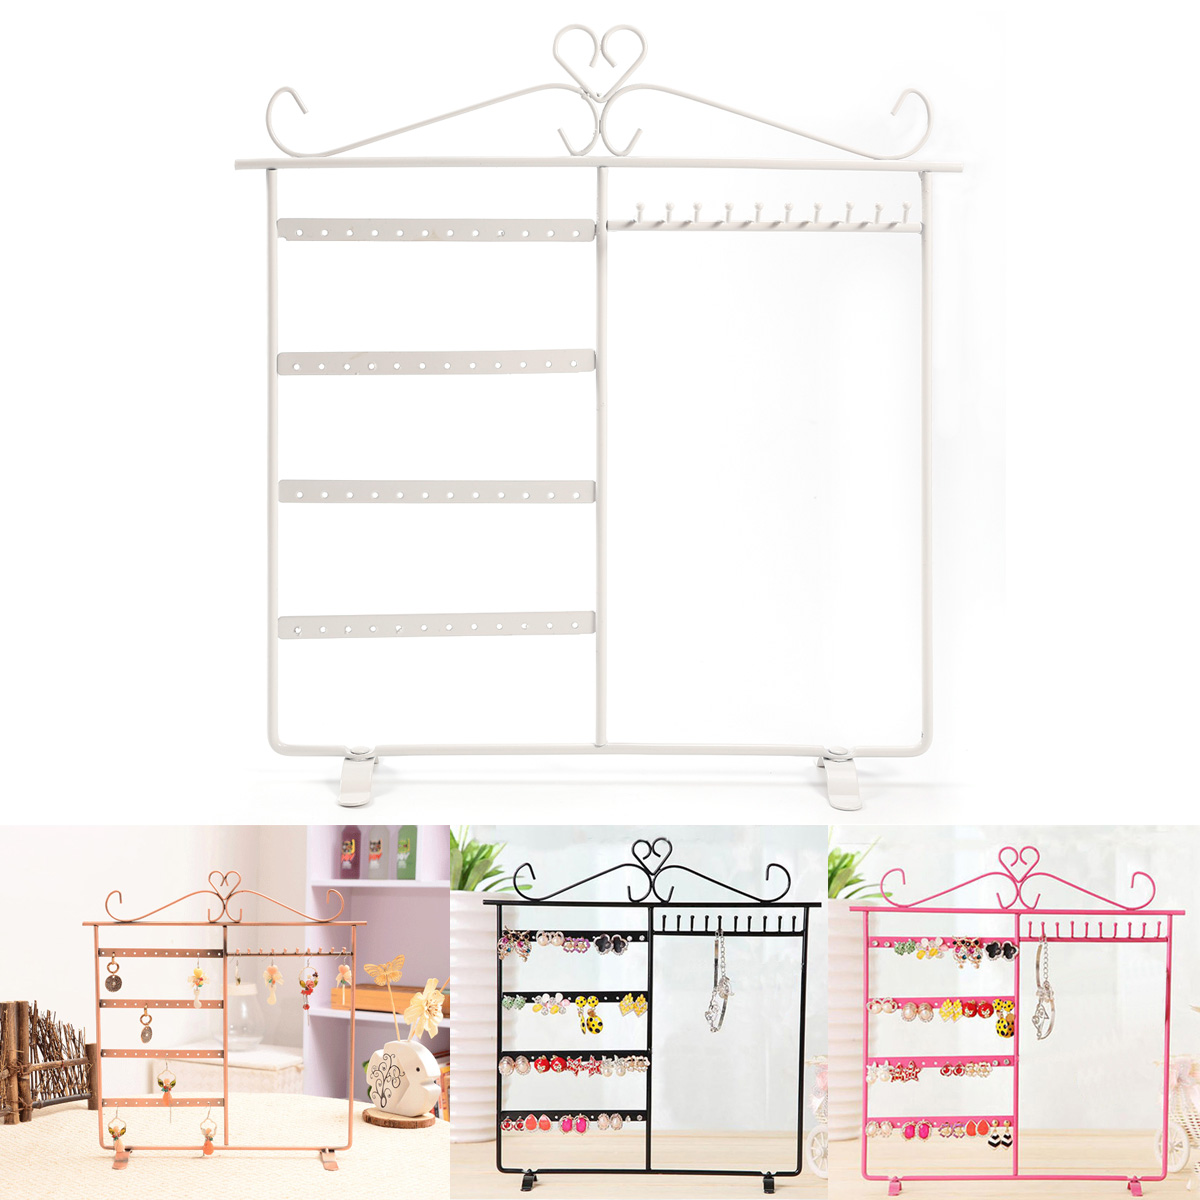 ohrringe halter ohrstecker aufbewahrung organizer display. Black Bedroom Furniture Sets. Home Design Ideas